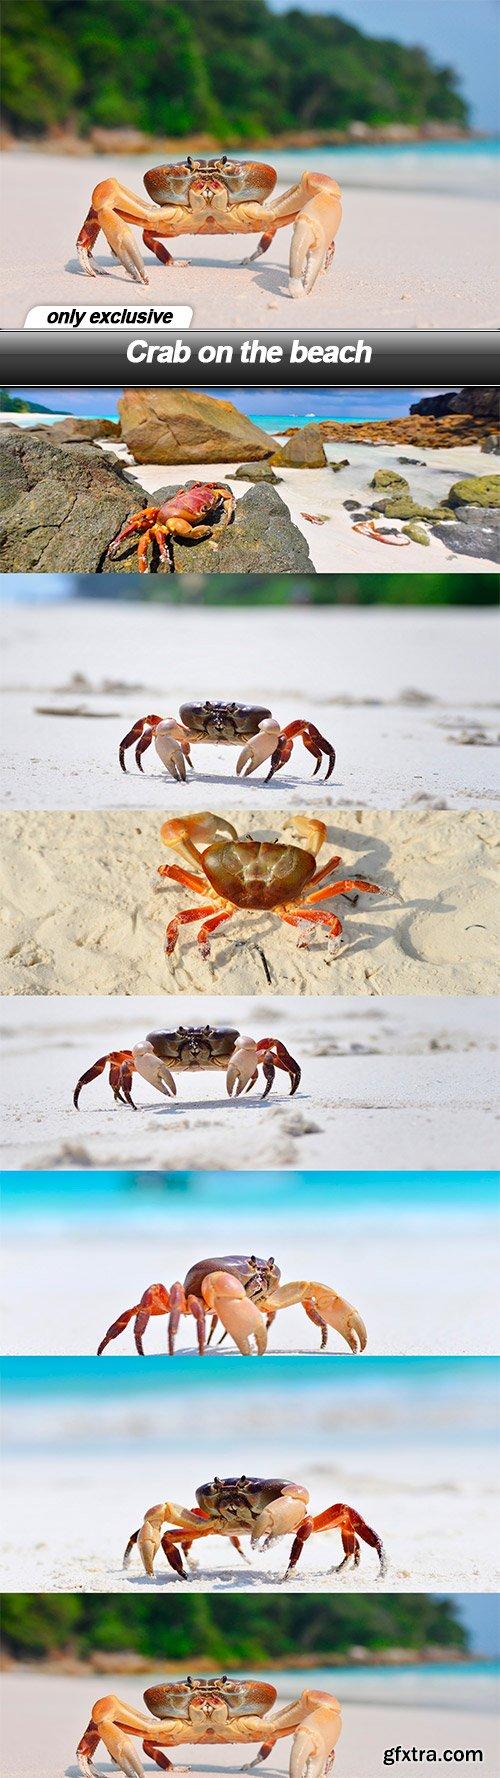 Crab on the beach - 7 UHQ JPEG